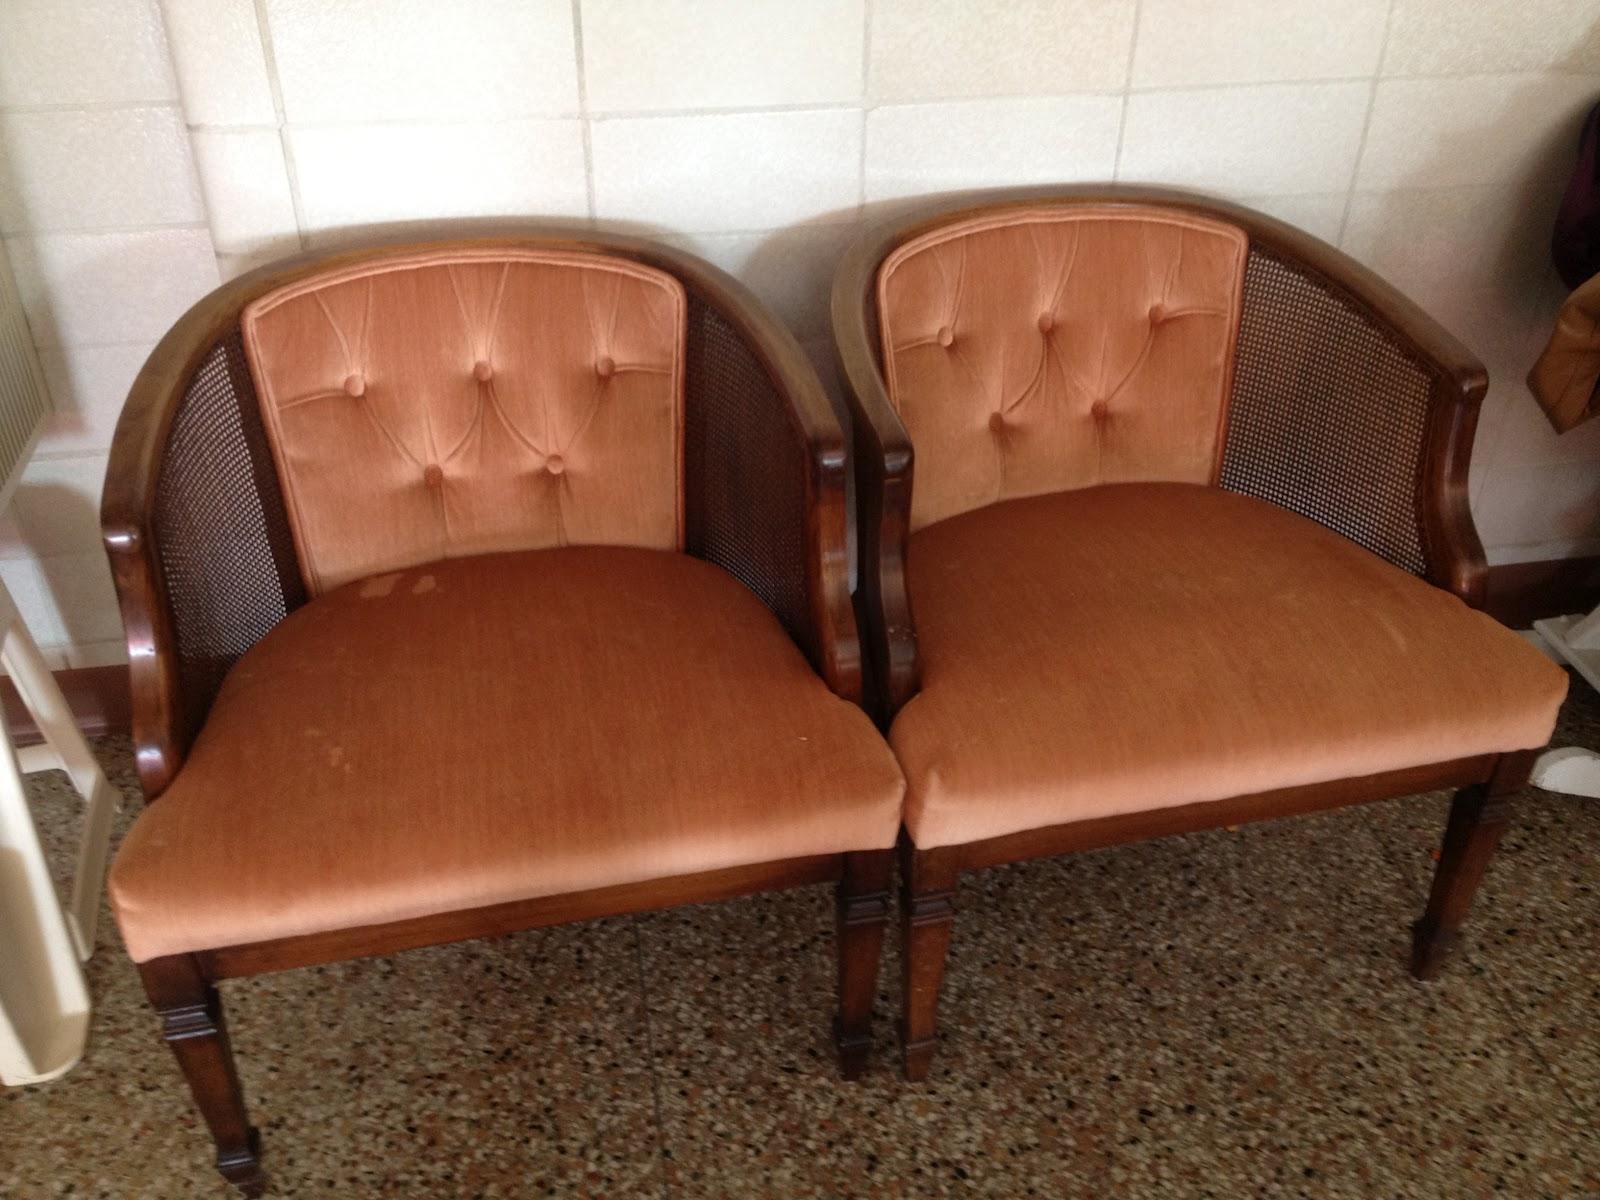 Peachy Viva Cindy Navarre Garage Sale Mania Machost Co Dining Chair Design Ideas Machostcouk